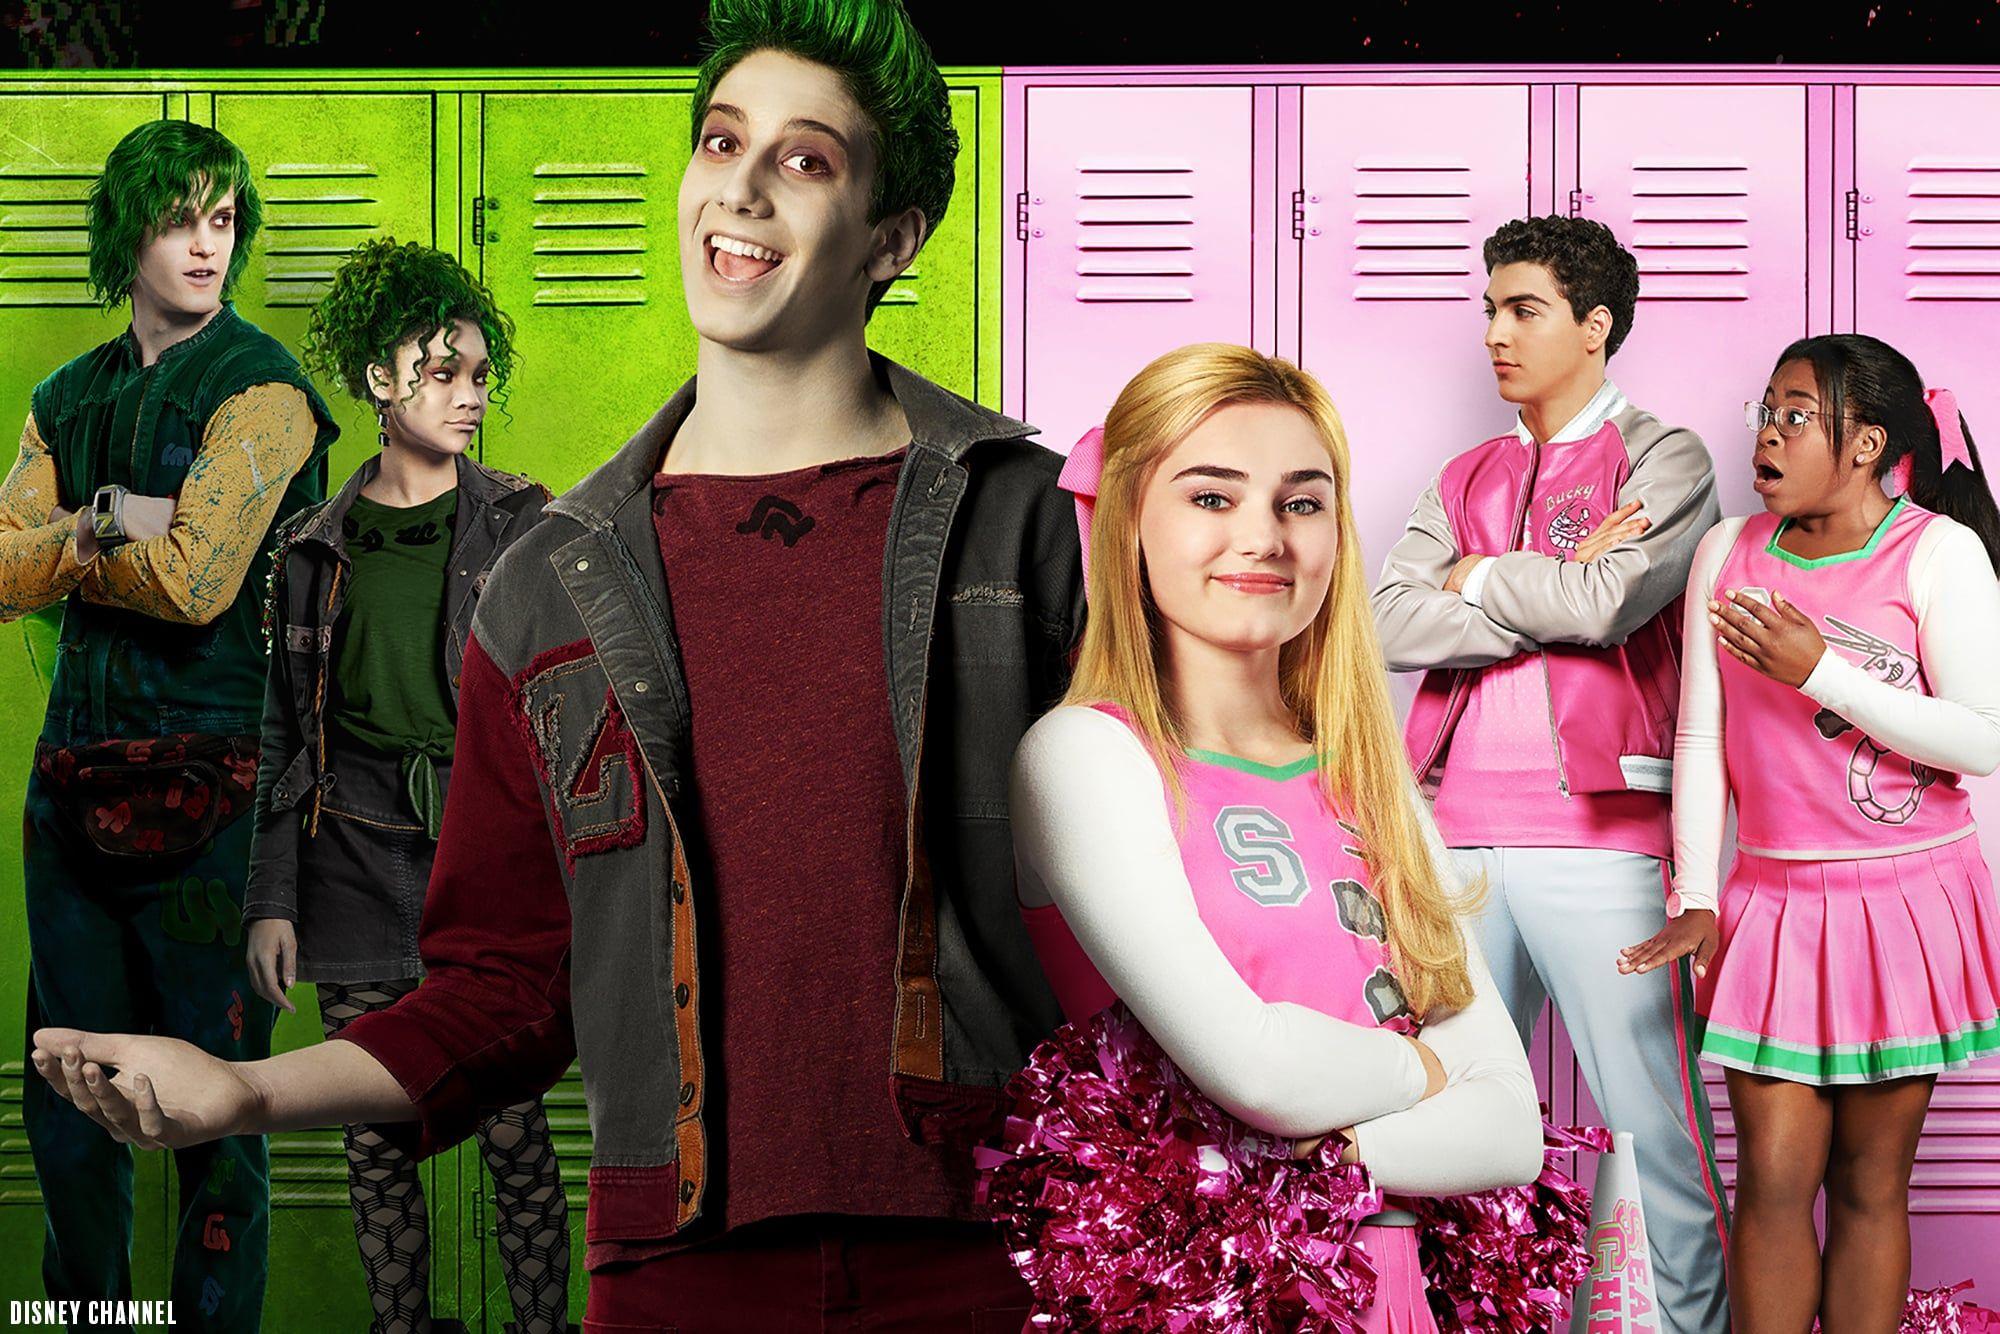 Meet The Cast Of The Disney Channel Original Movie Zombies Zombie Disney Pelicula Disney Channel Disney Challenge